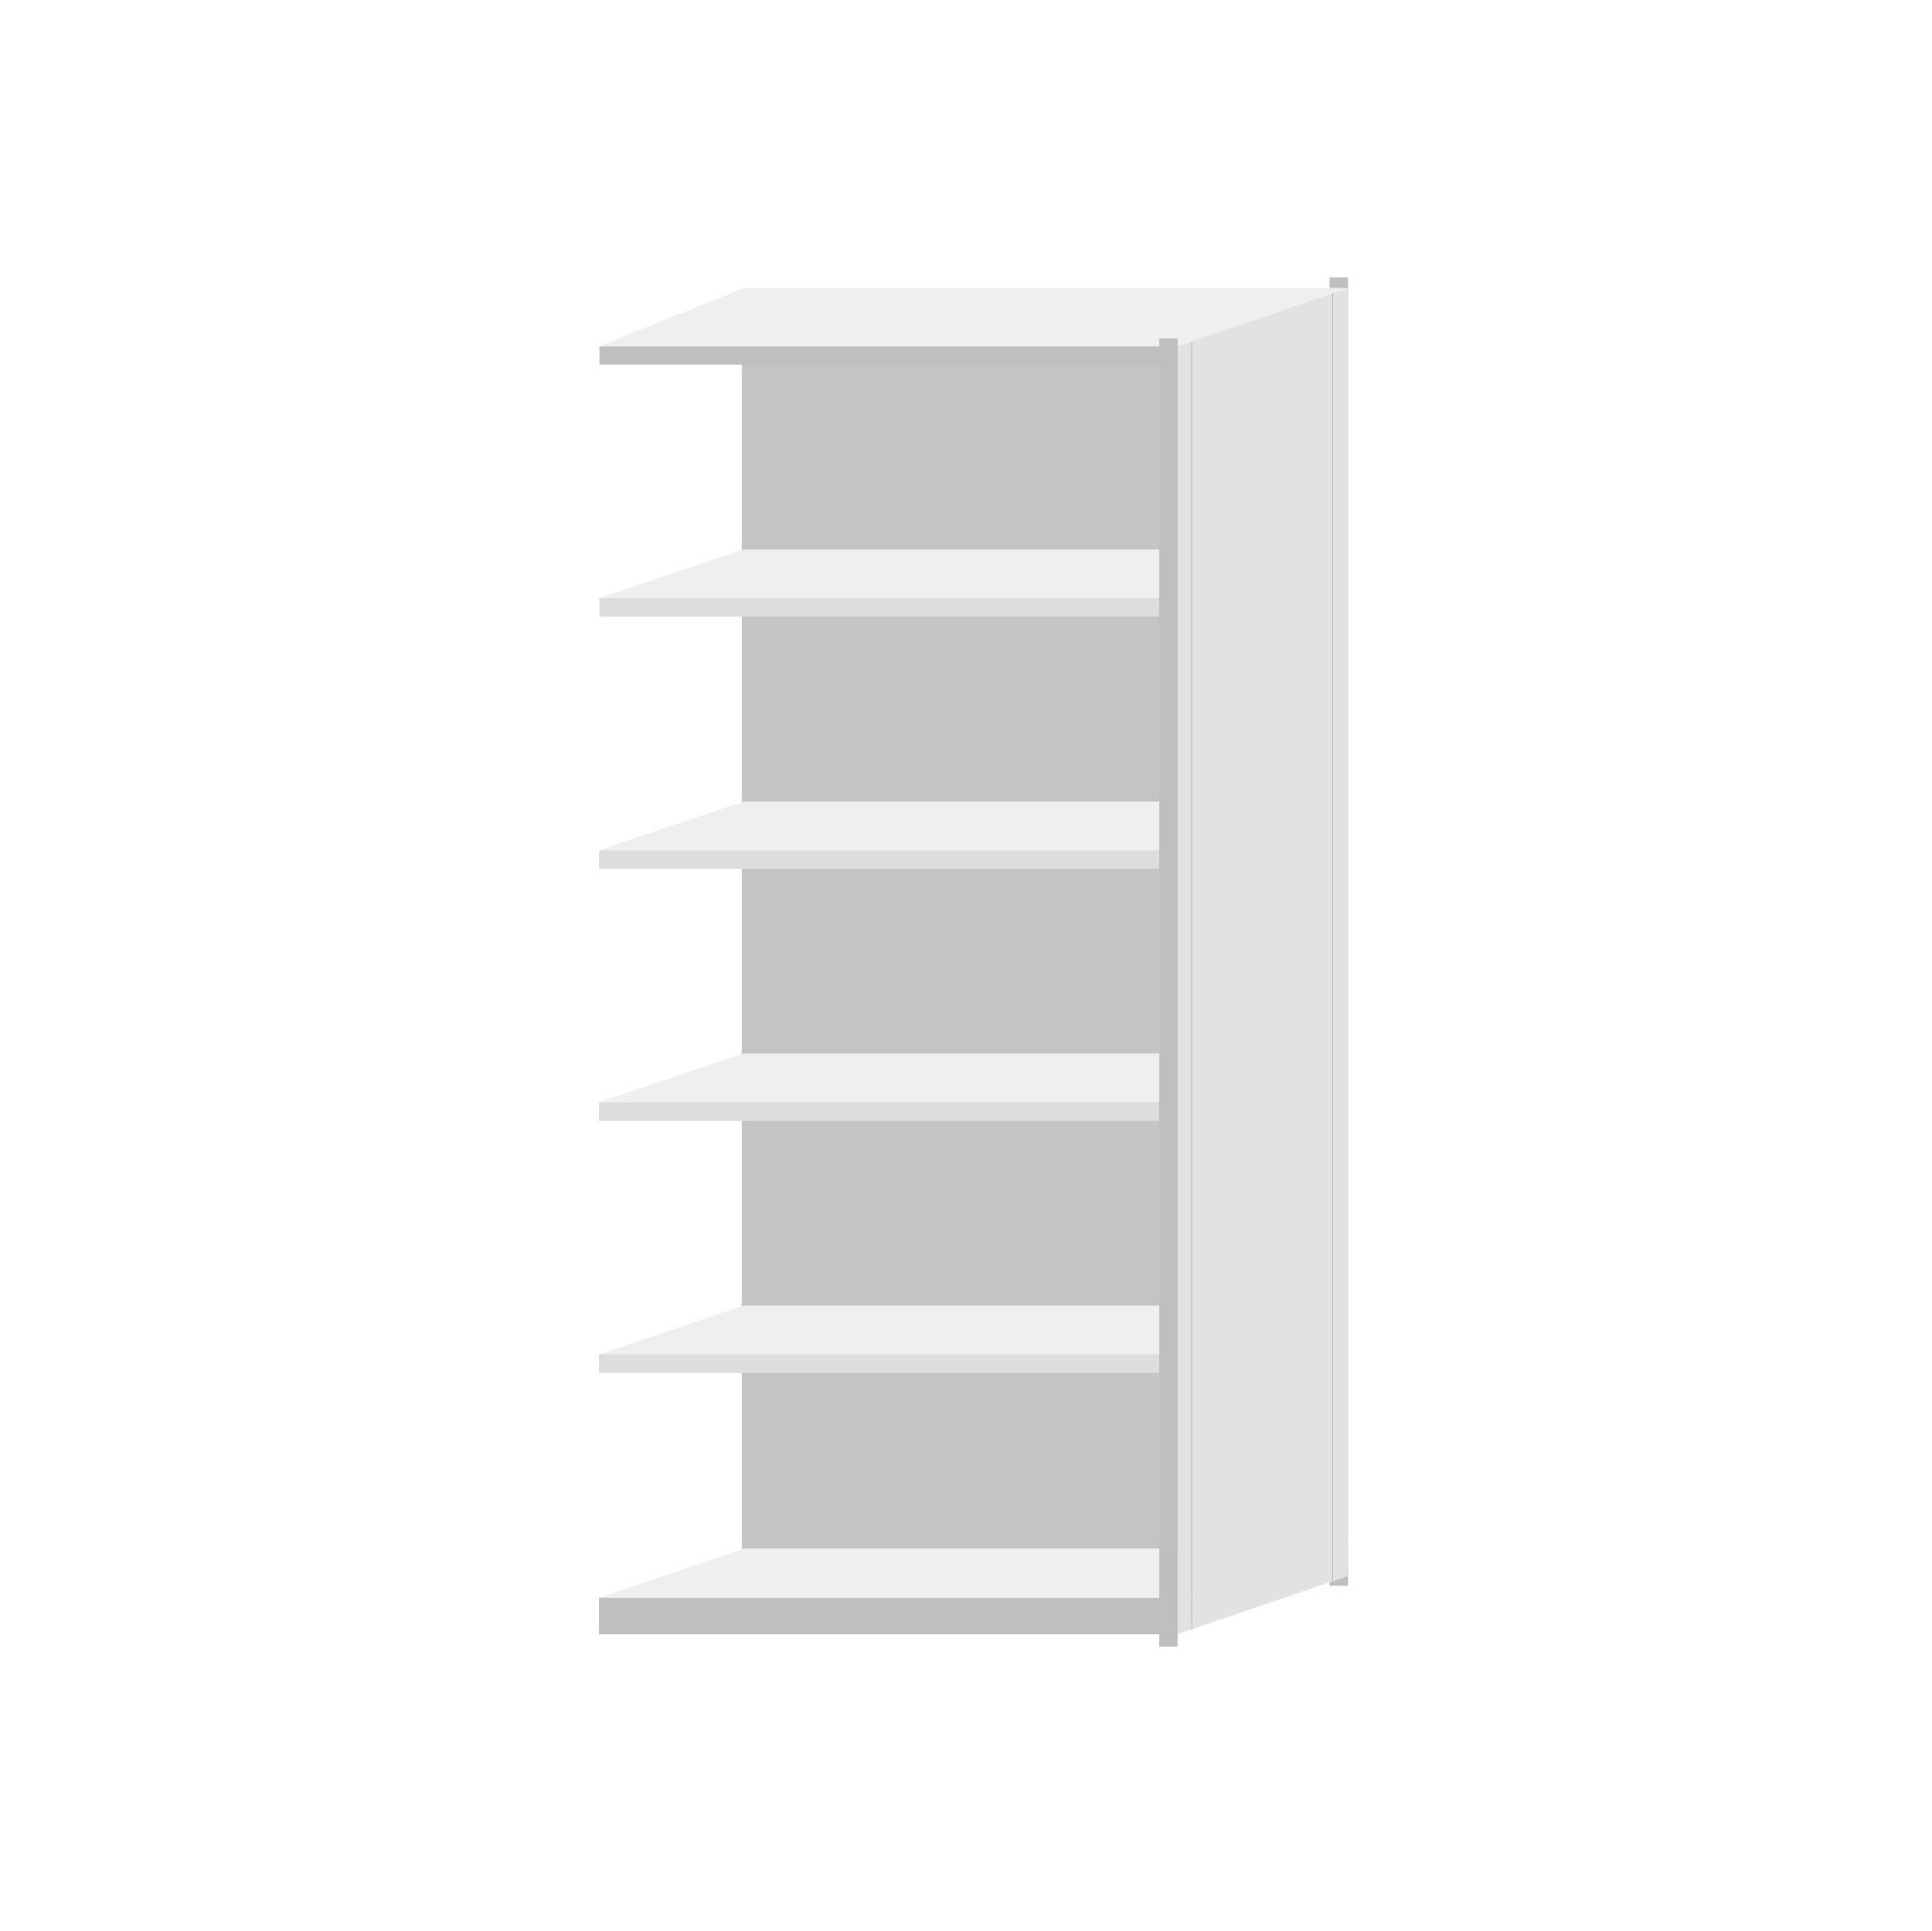 RUT Add-On Bay 900mm Wide - 6 Levels (Single Sided)